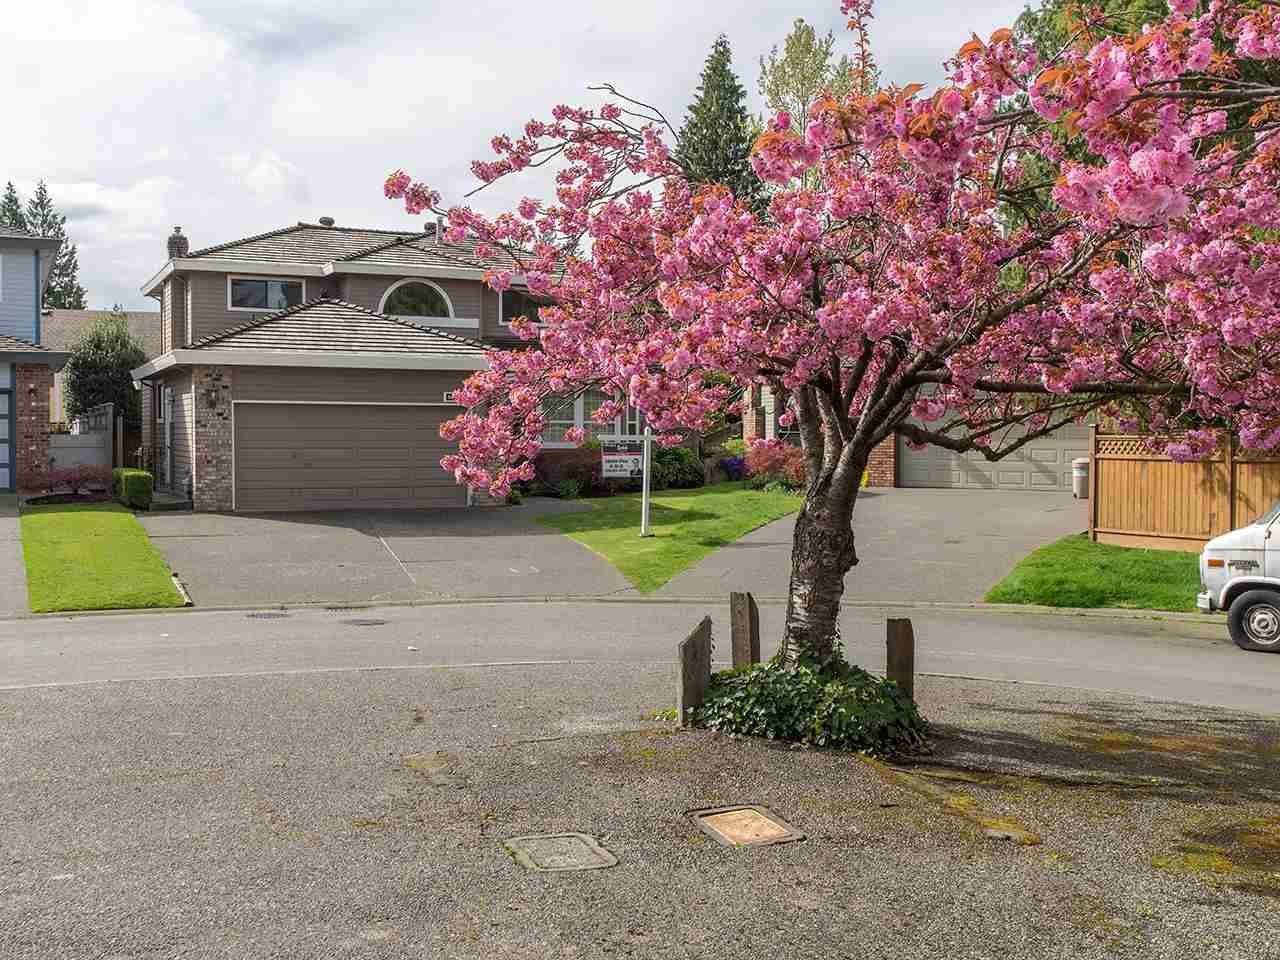 Main Photo: 6567 SUNWOOD DRIVE in Delta: Sunshine Hills Woods House for sale (N. Delta)  : MLS®# R2052481